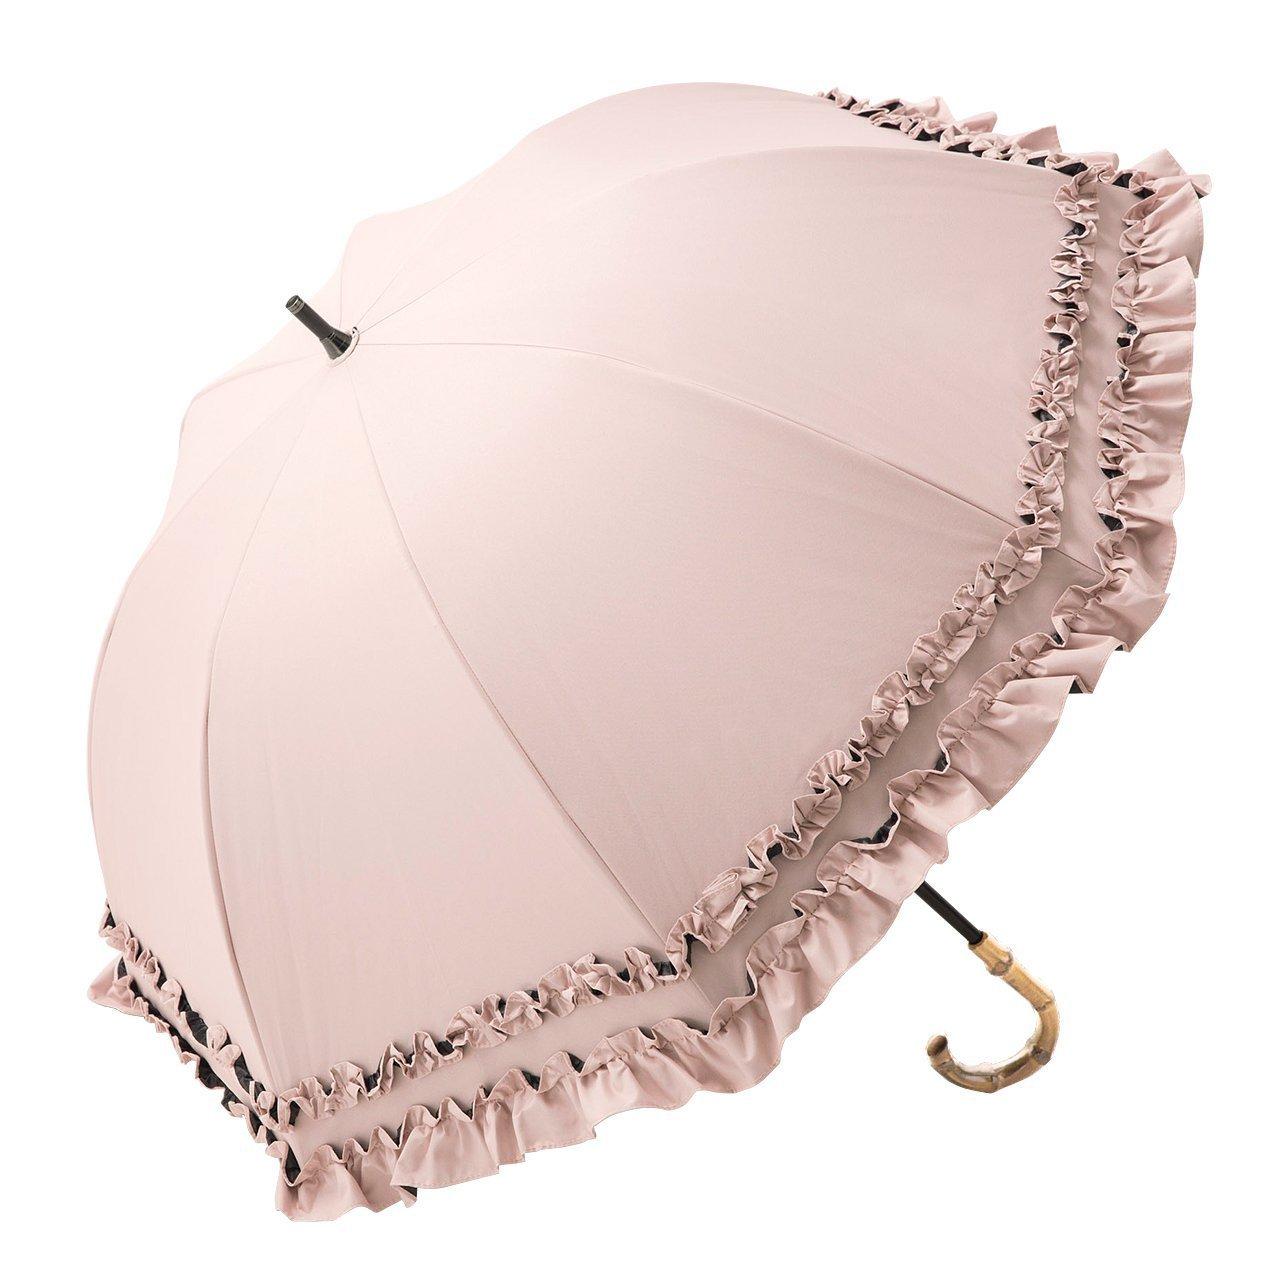 【Rose Blanc】100%完全遮光 日傘 ダブルフリル ショートサイズ プレーン 50cm (ピンク) B07C2P1PR6 ピンク ピンク